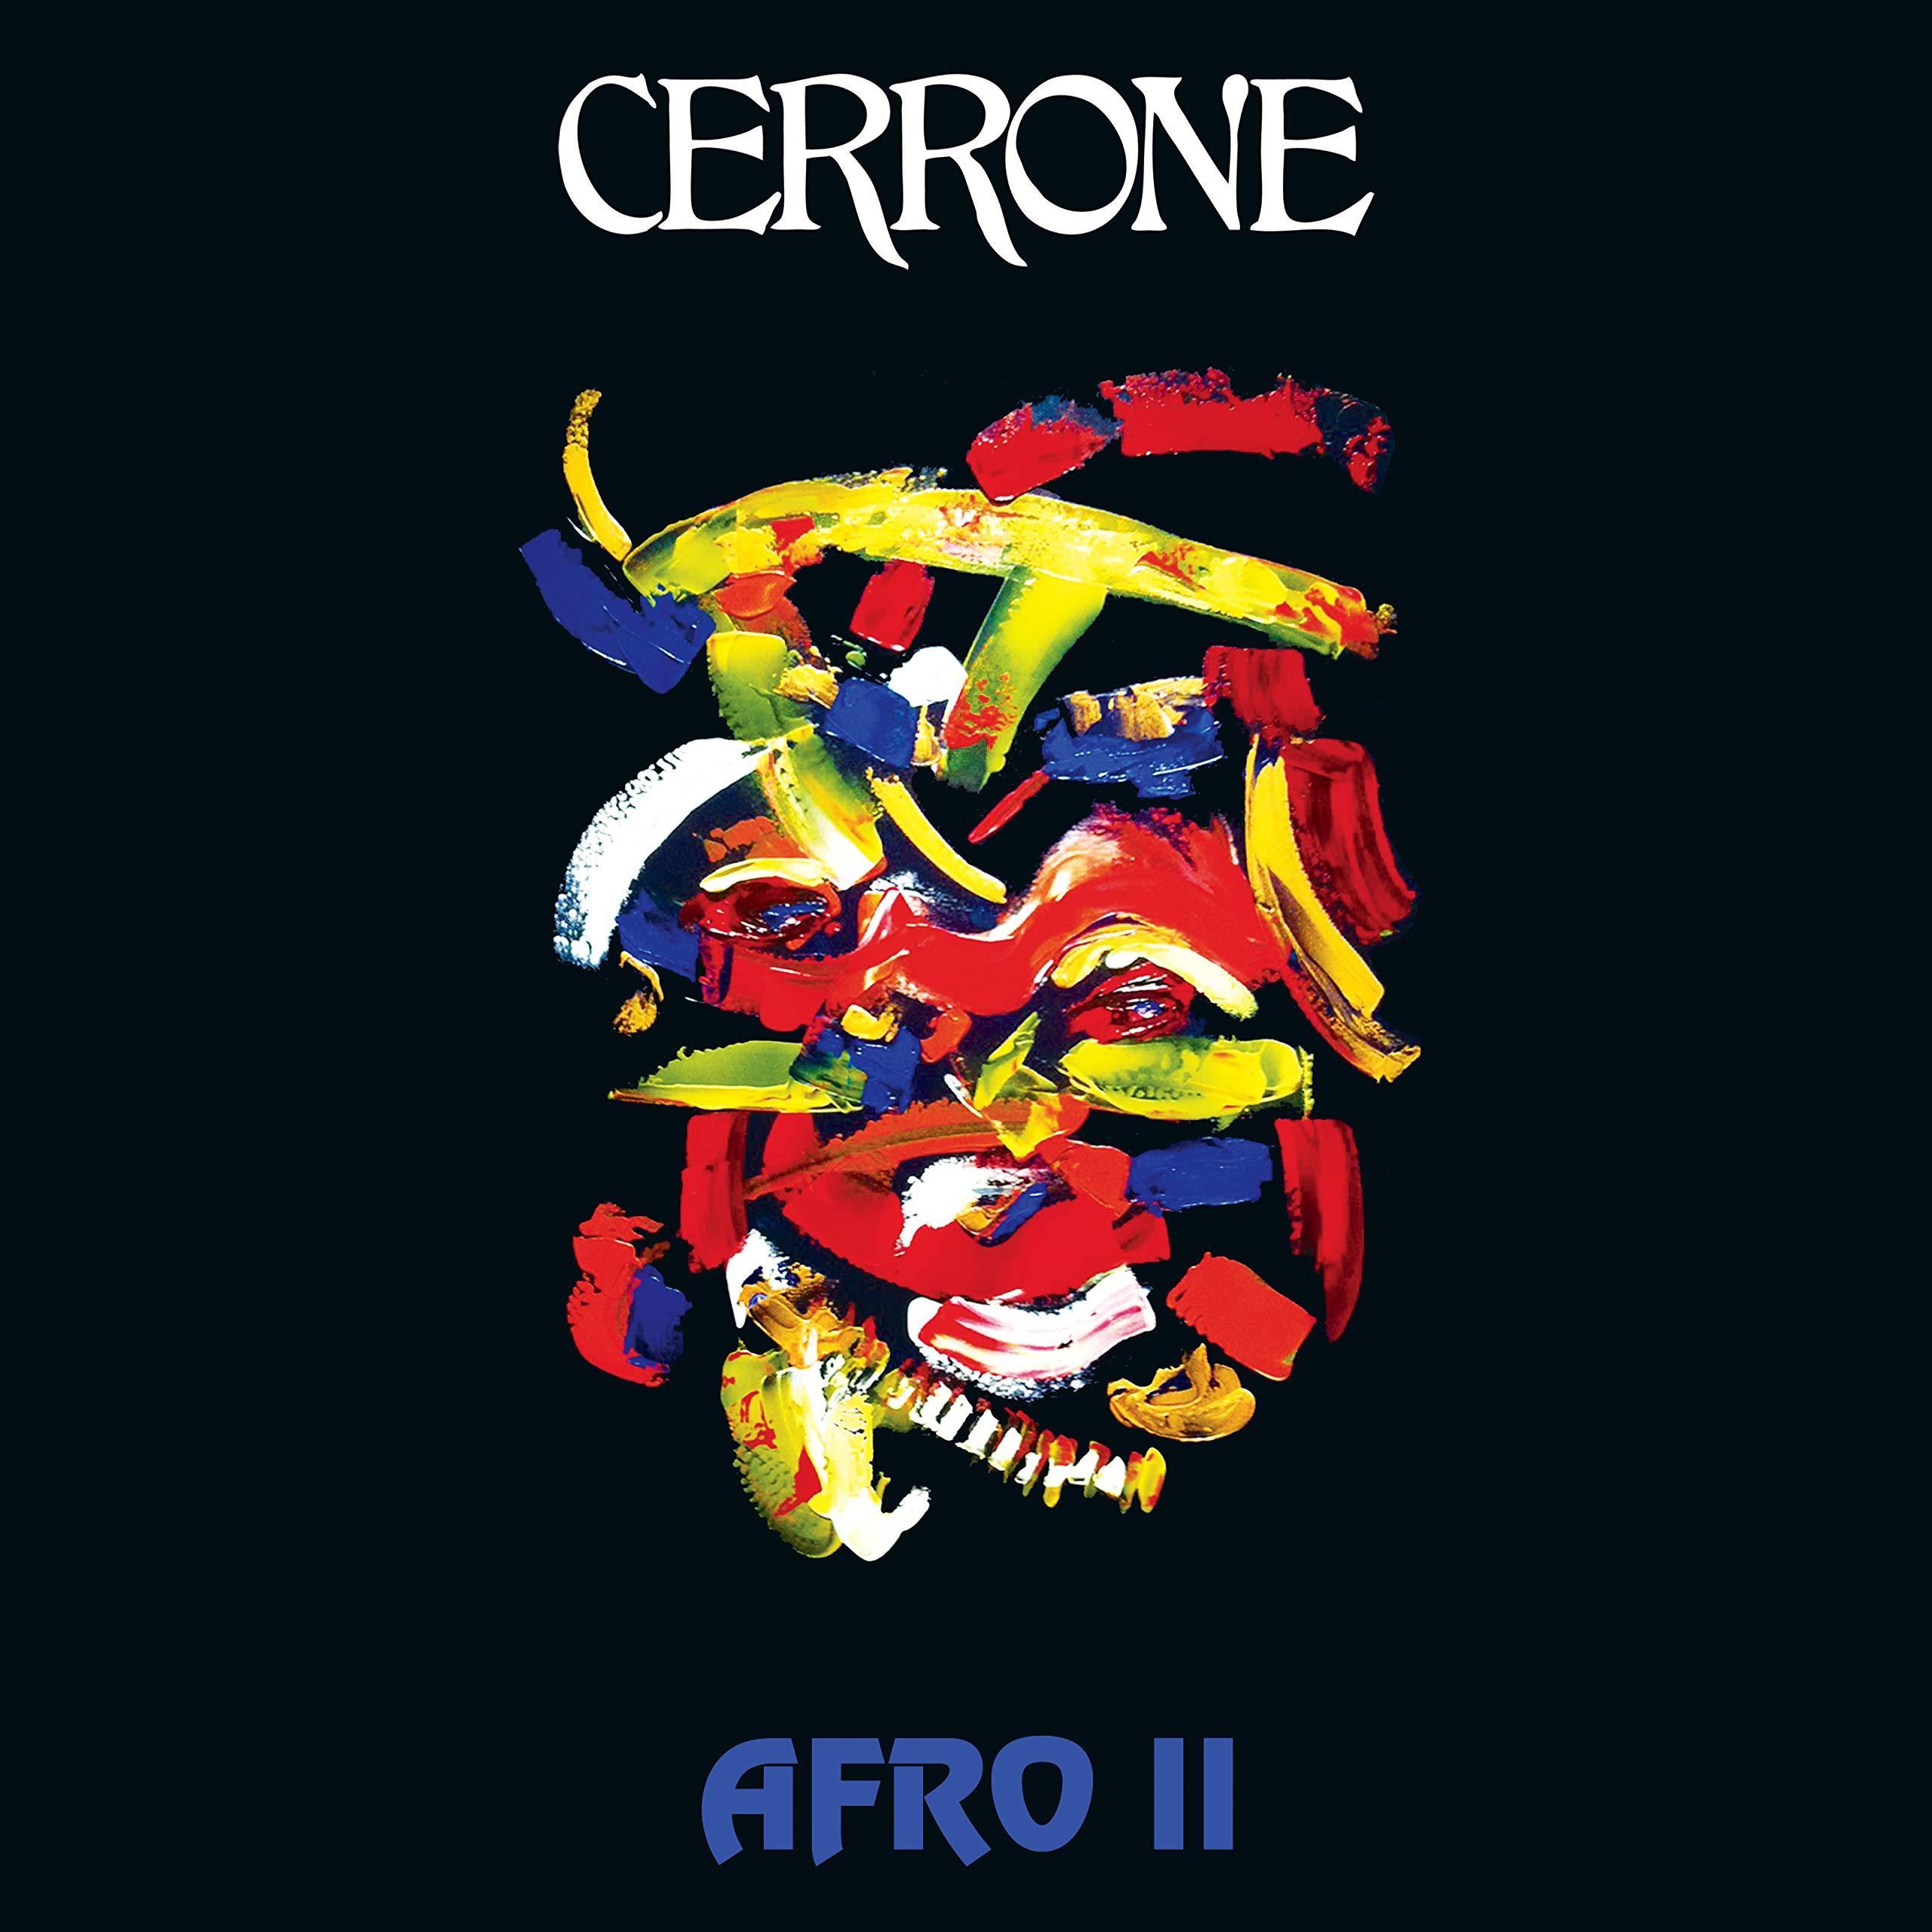 Vinilo : Cerrone - Afro Ii (Extended Play, United Kingdom - Import)